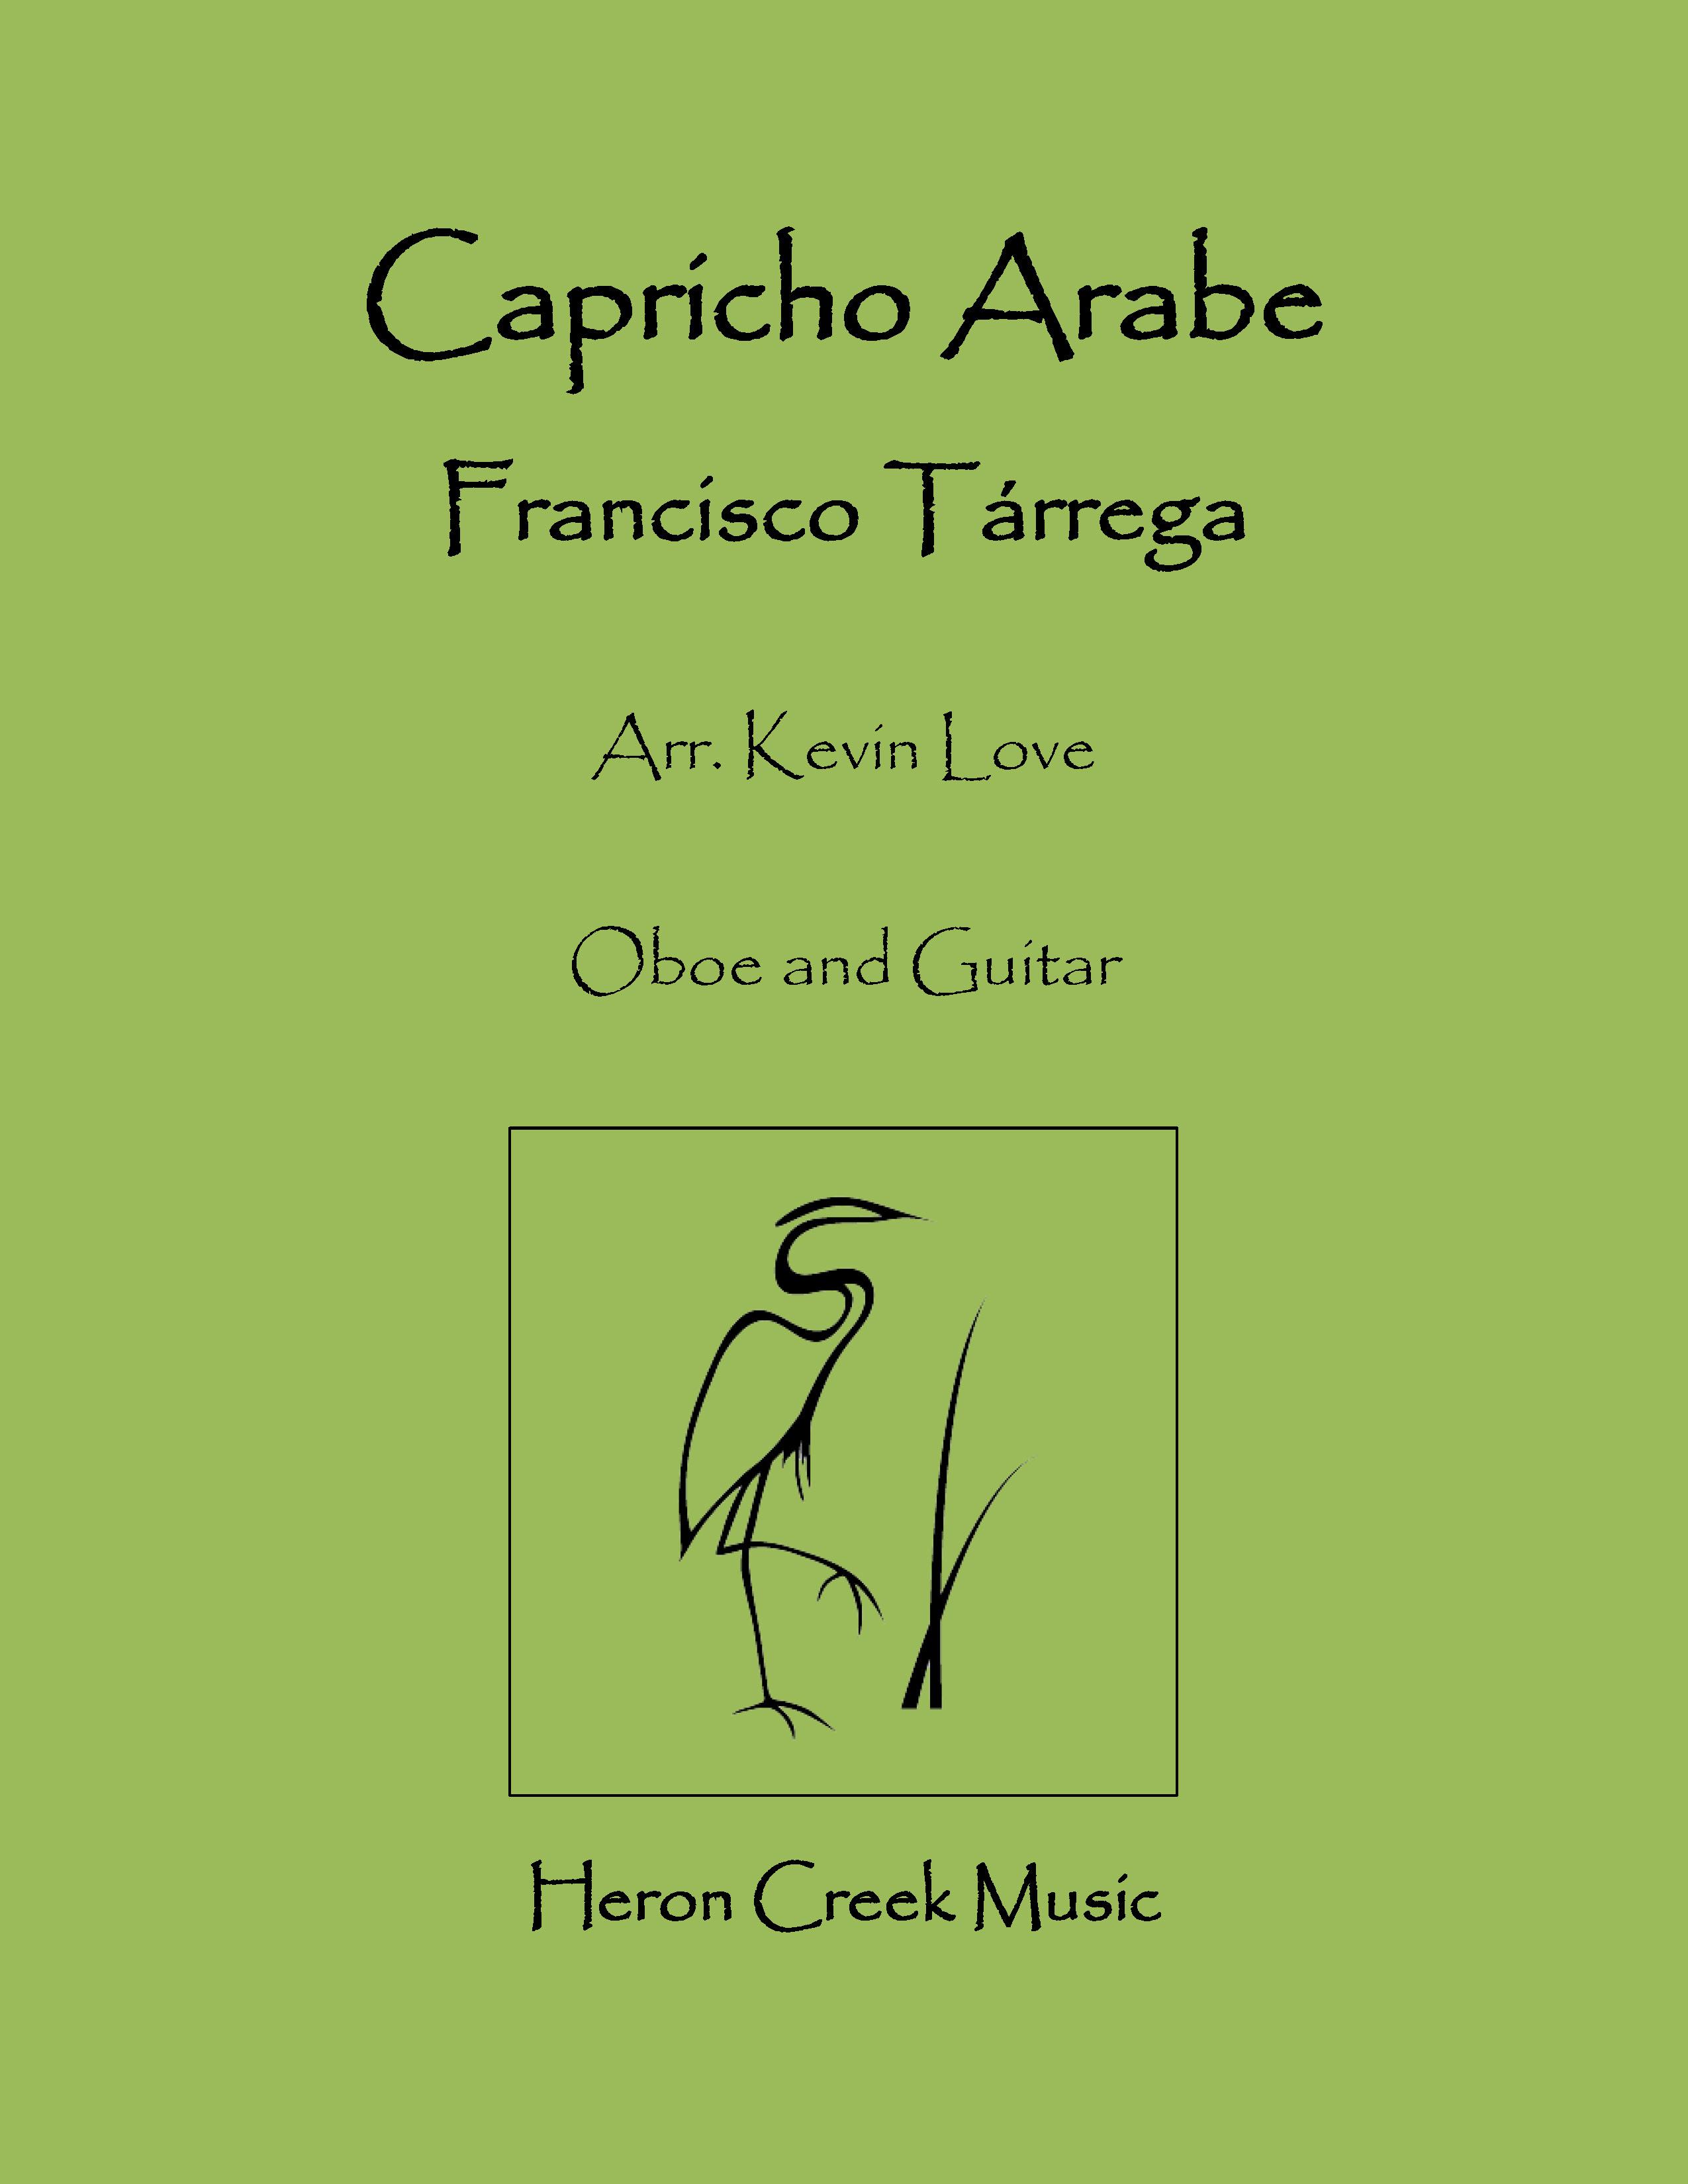 Capricho Arabe